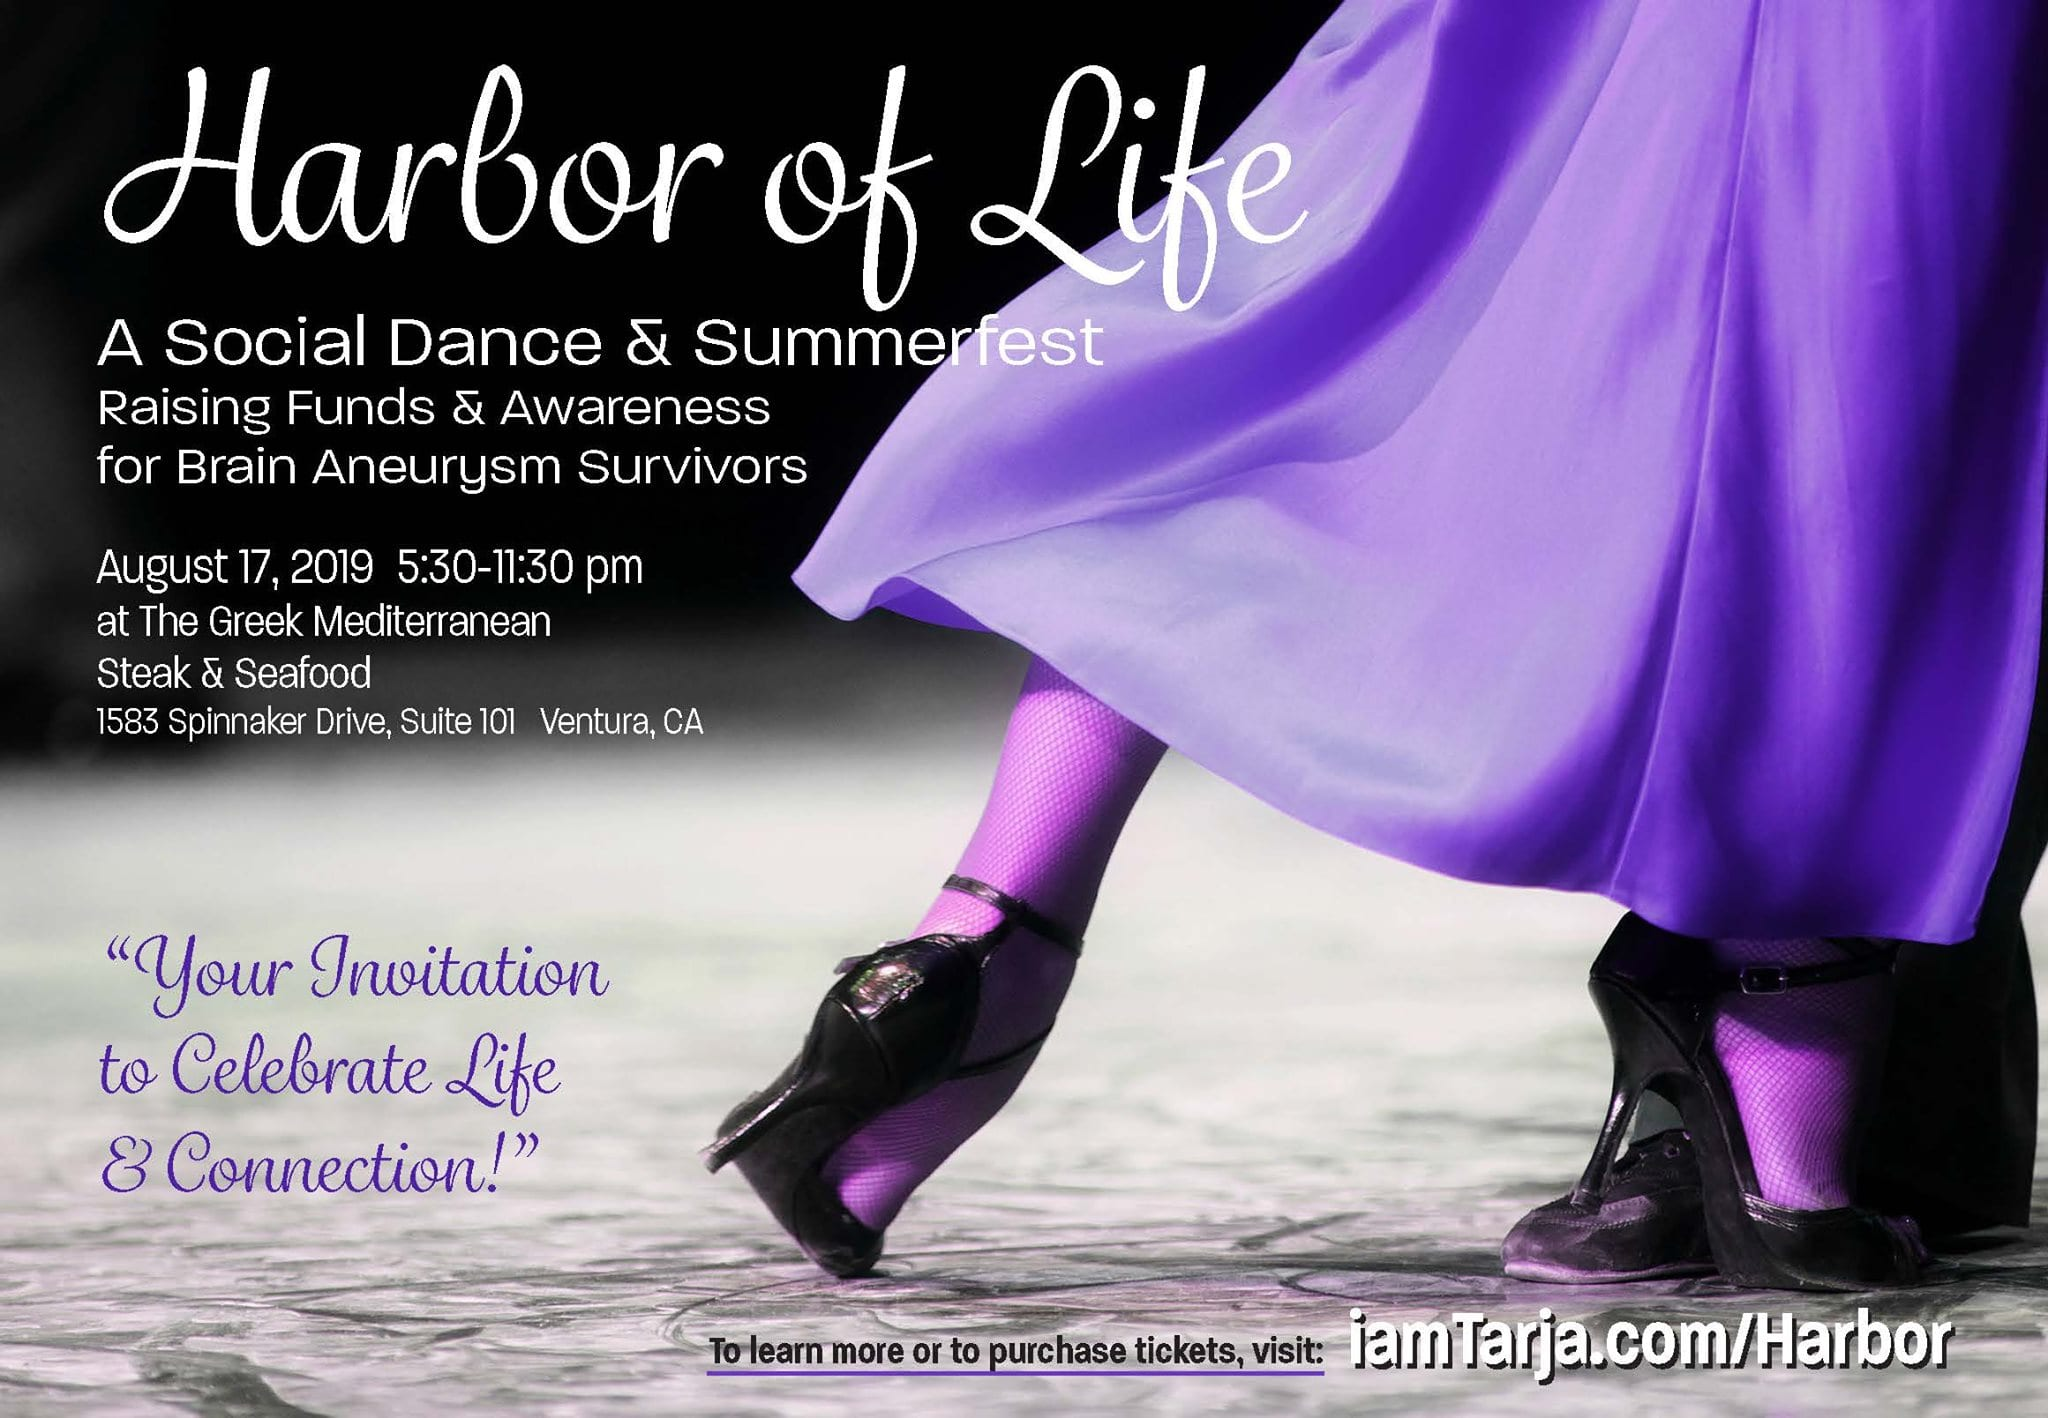 Harbor of Life Promo